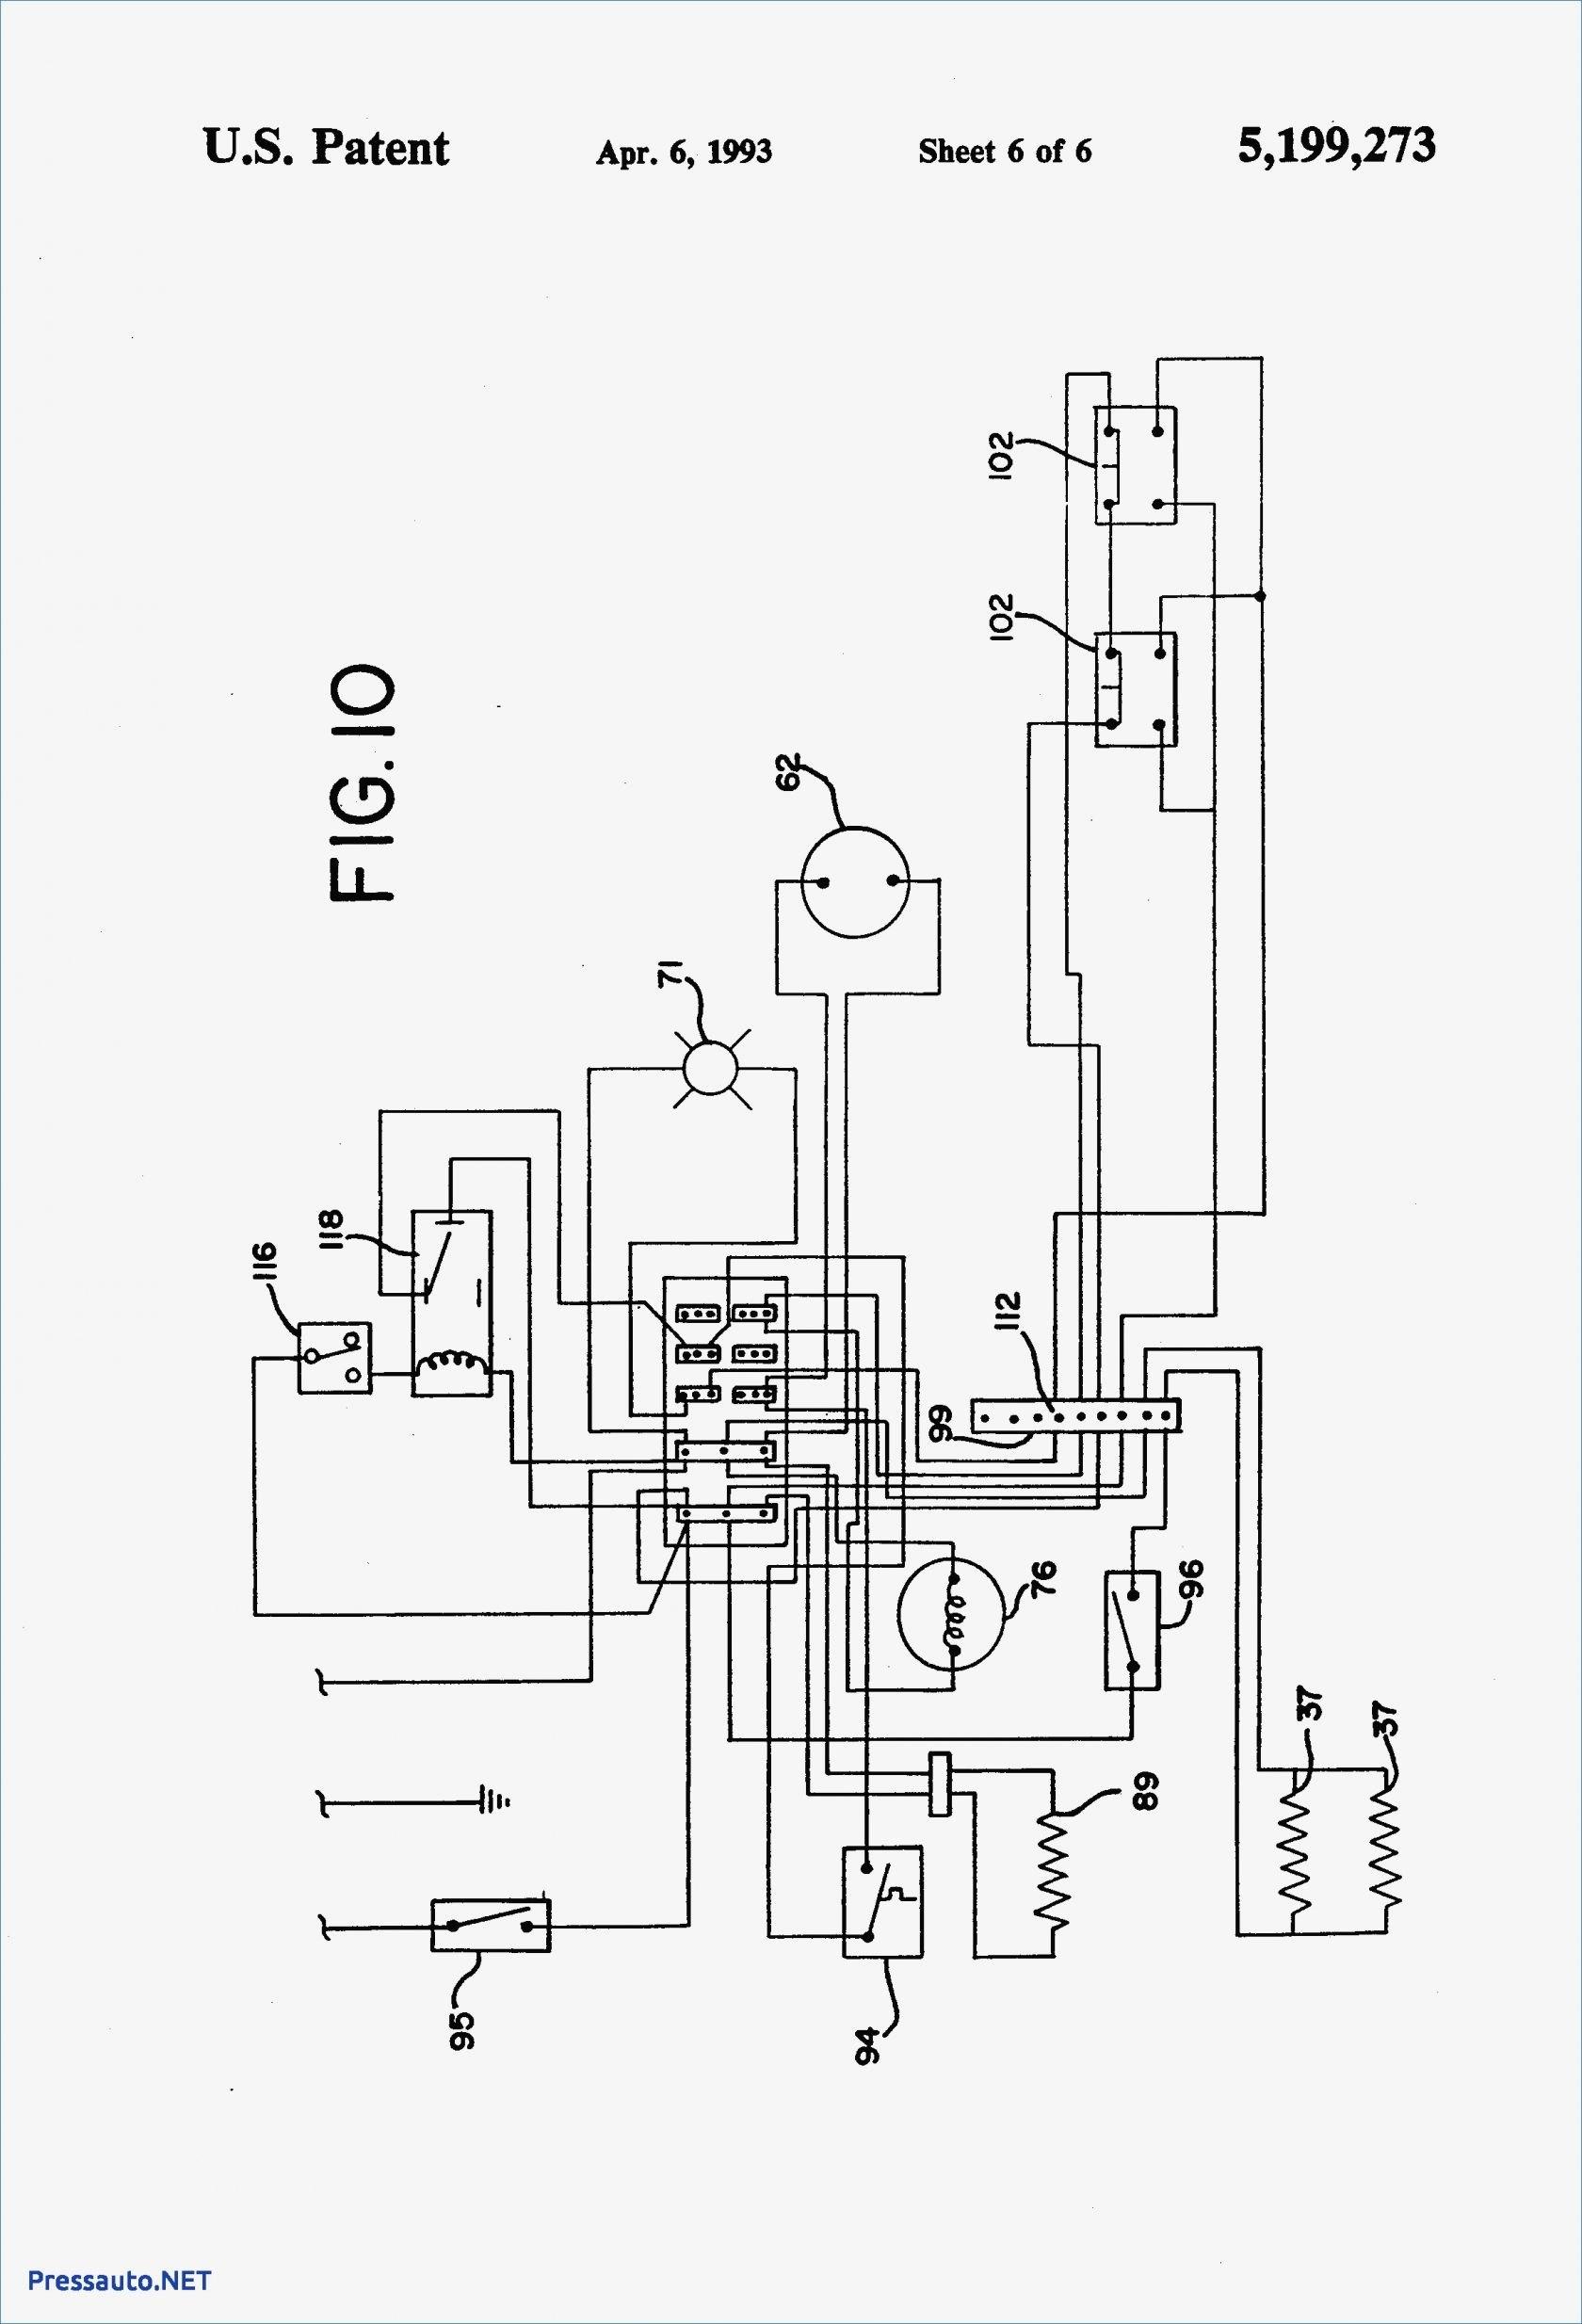 CS_7981] Gdm True Refrigerator Parts Diagram Free Download Wiring Diagram  Free Diagram   True T 23f Wiring Diagram      Sheox Coun Penghe Ilari Gresi Chro Carn Ospor Garna Grebs Unho Rele  Mohammedshrine Librar Wiring 101